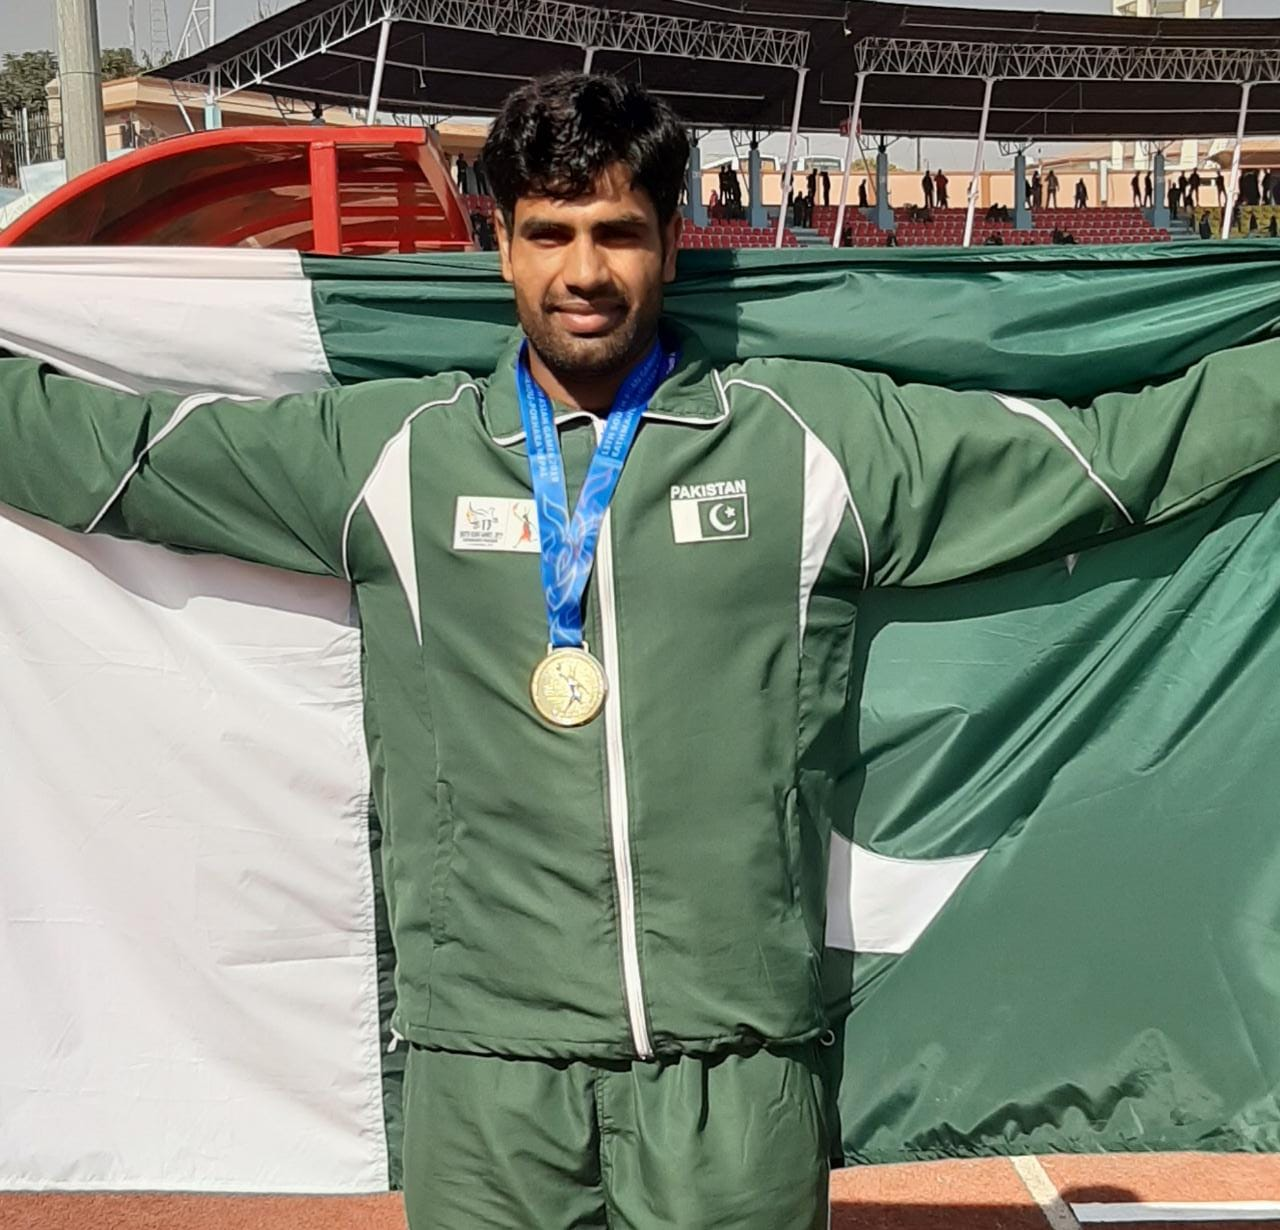 sag gold medallist arshad nadeem training in china to fulfil tokyo olympics dream